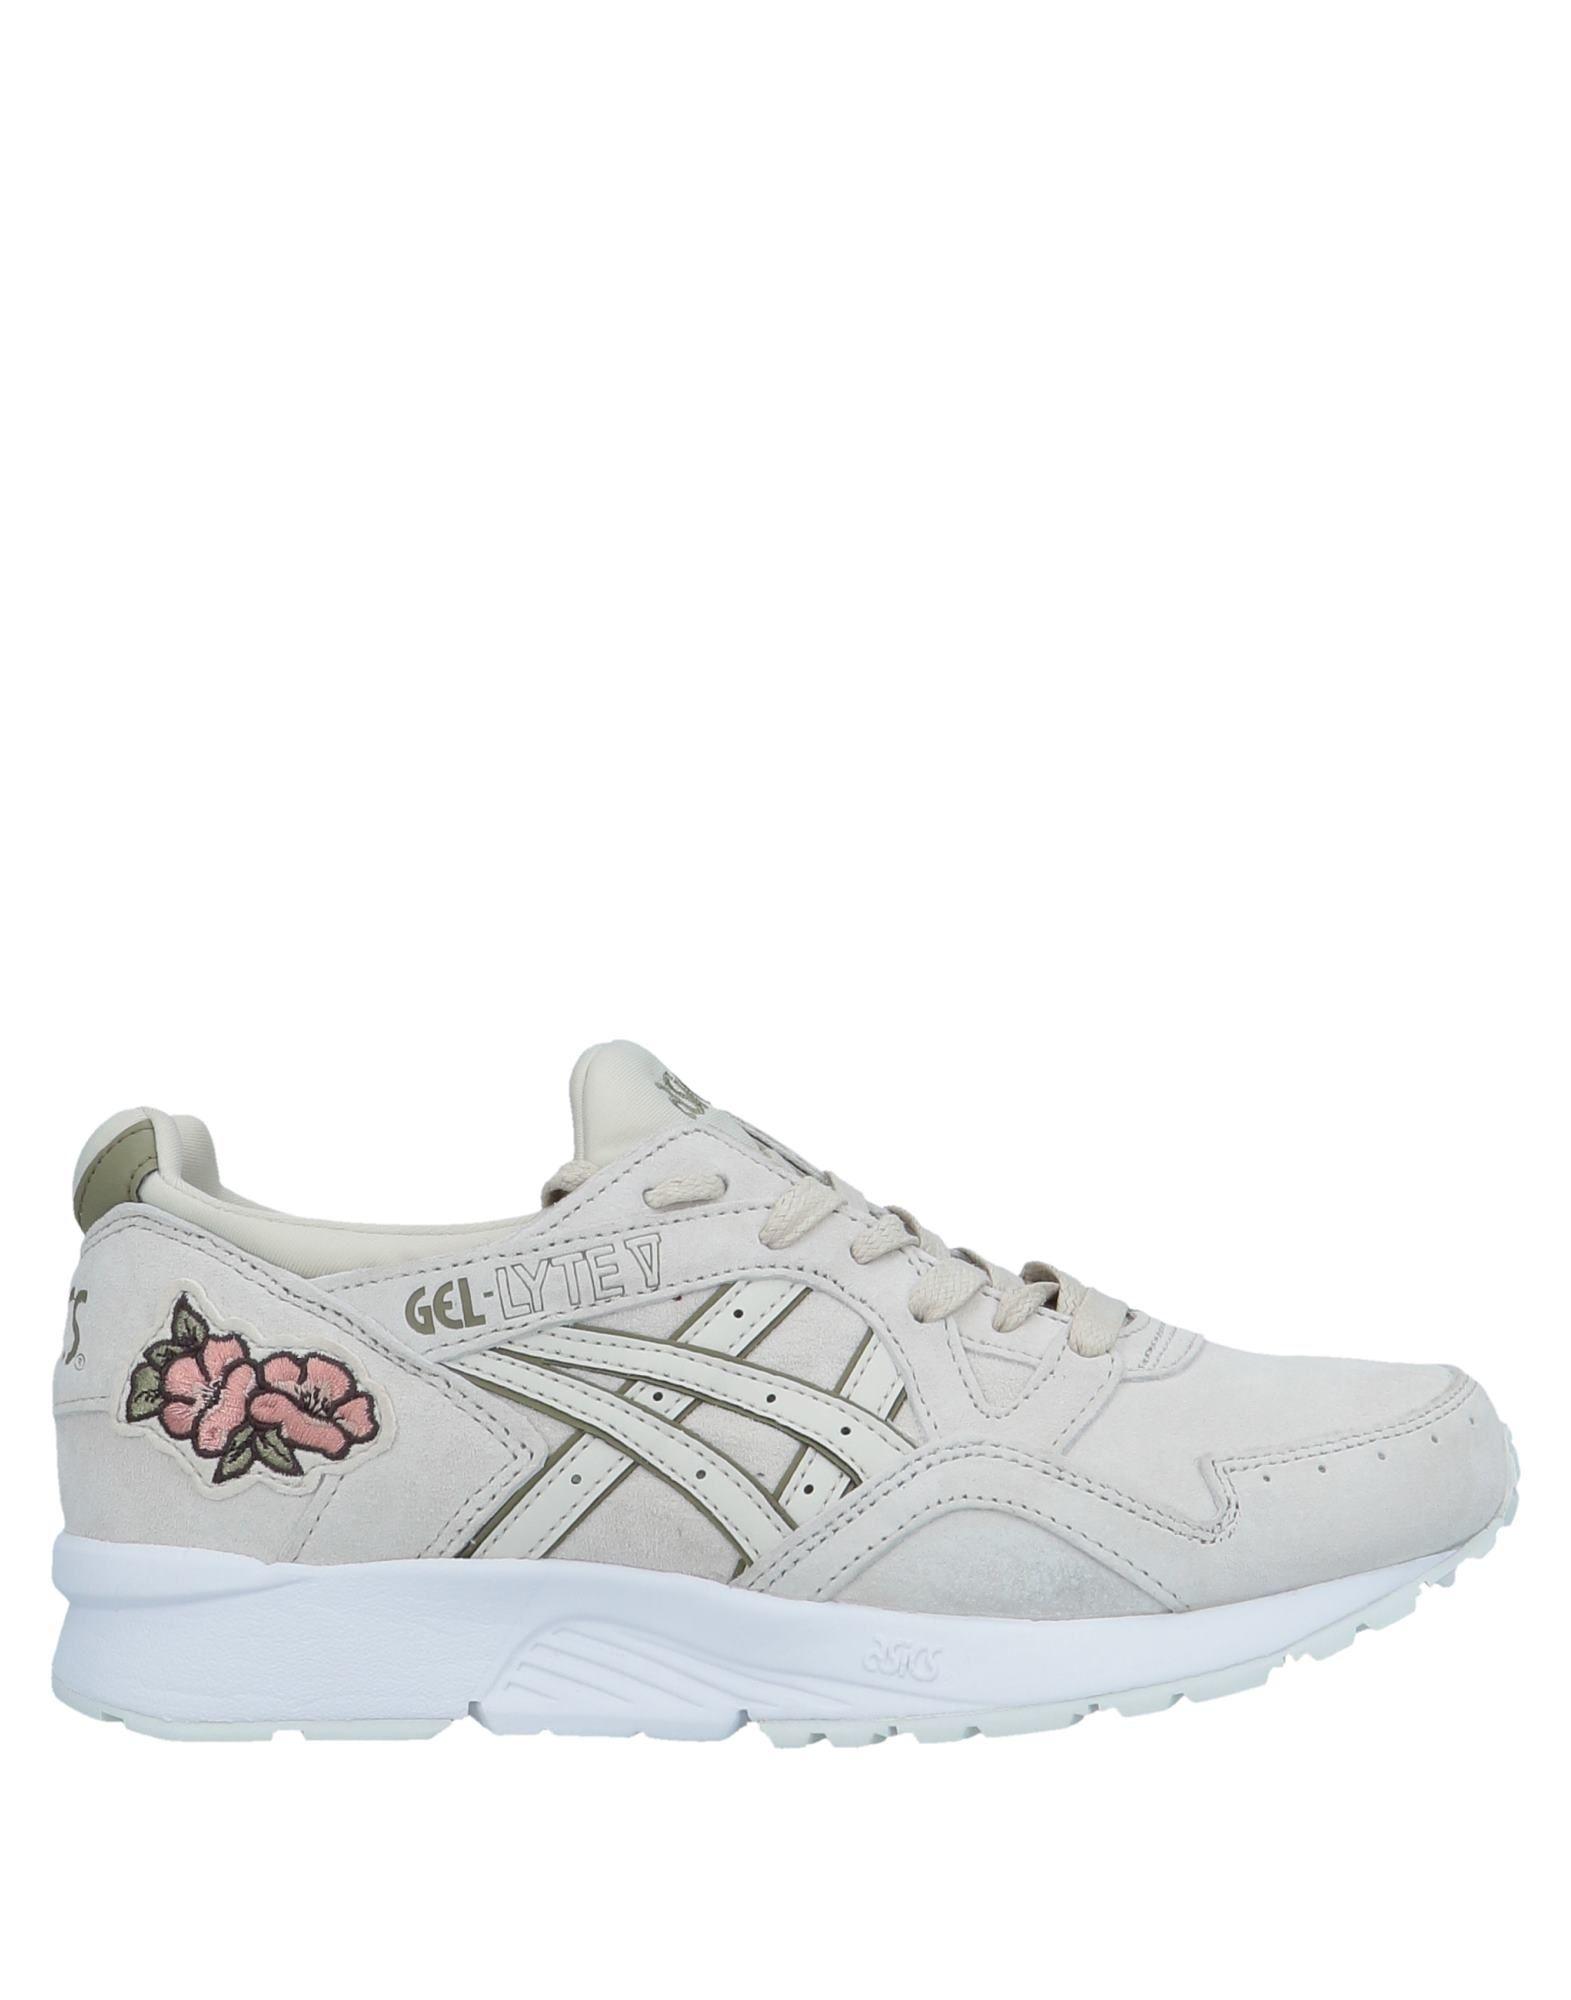 Beige Zapatillas Asics Tiger Mujer Mujer Mujer - Zapatillas Asics Tiger Los zapatos más populares para  hombres  y mujeres 16aaa1